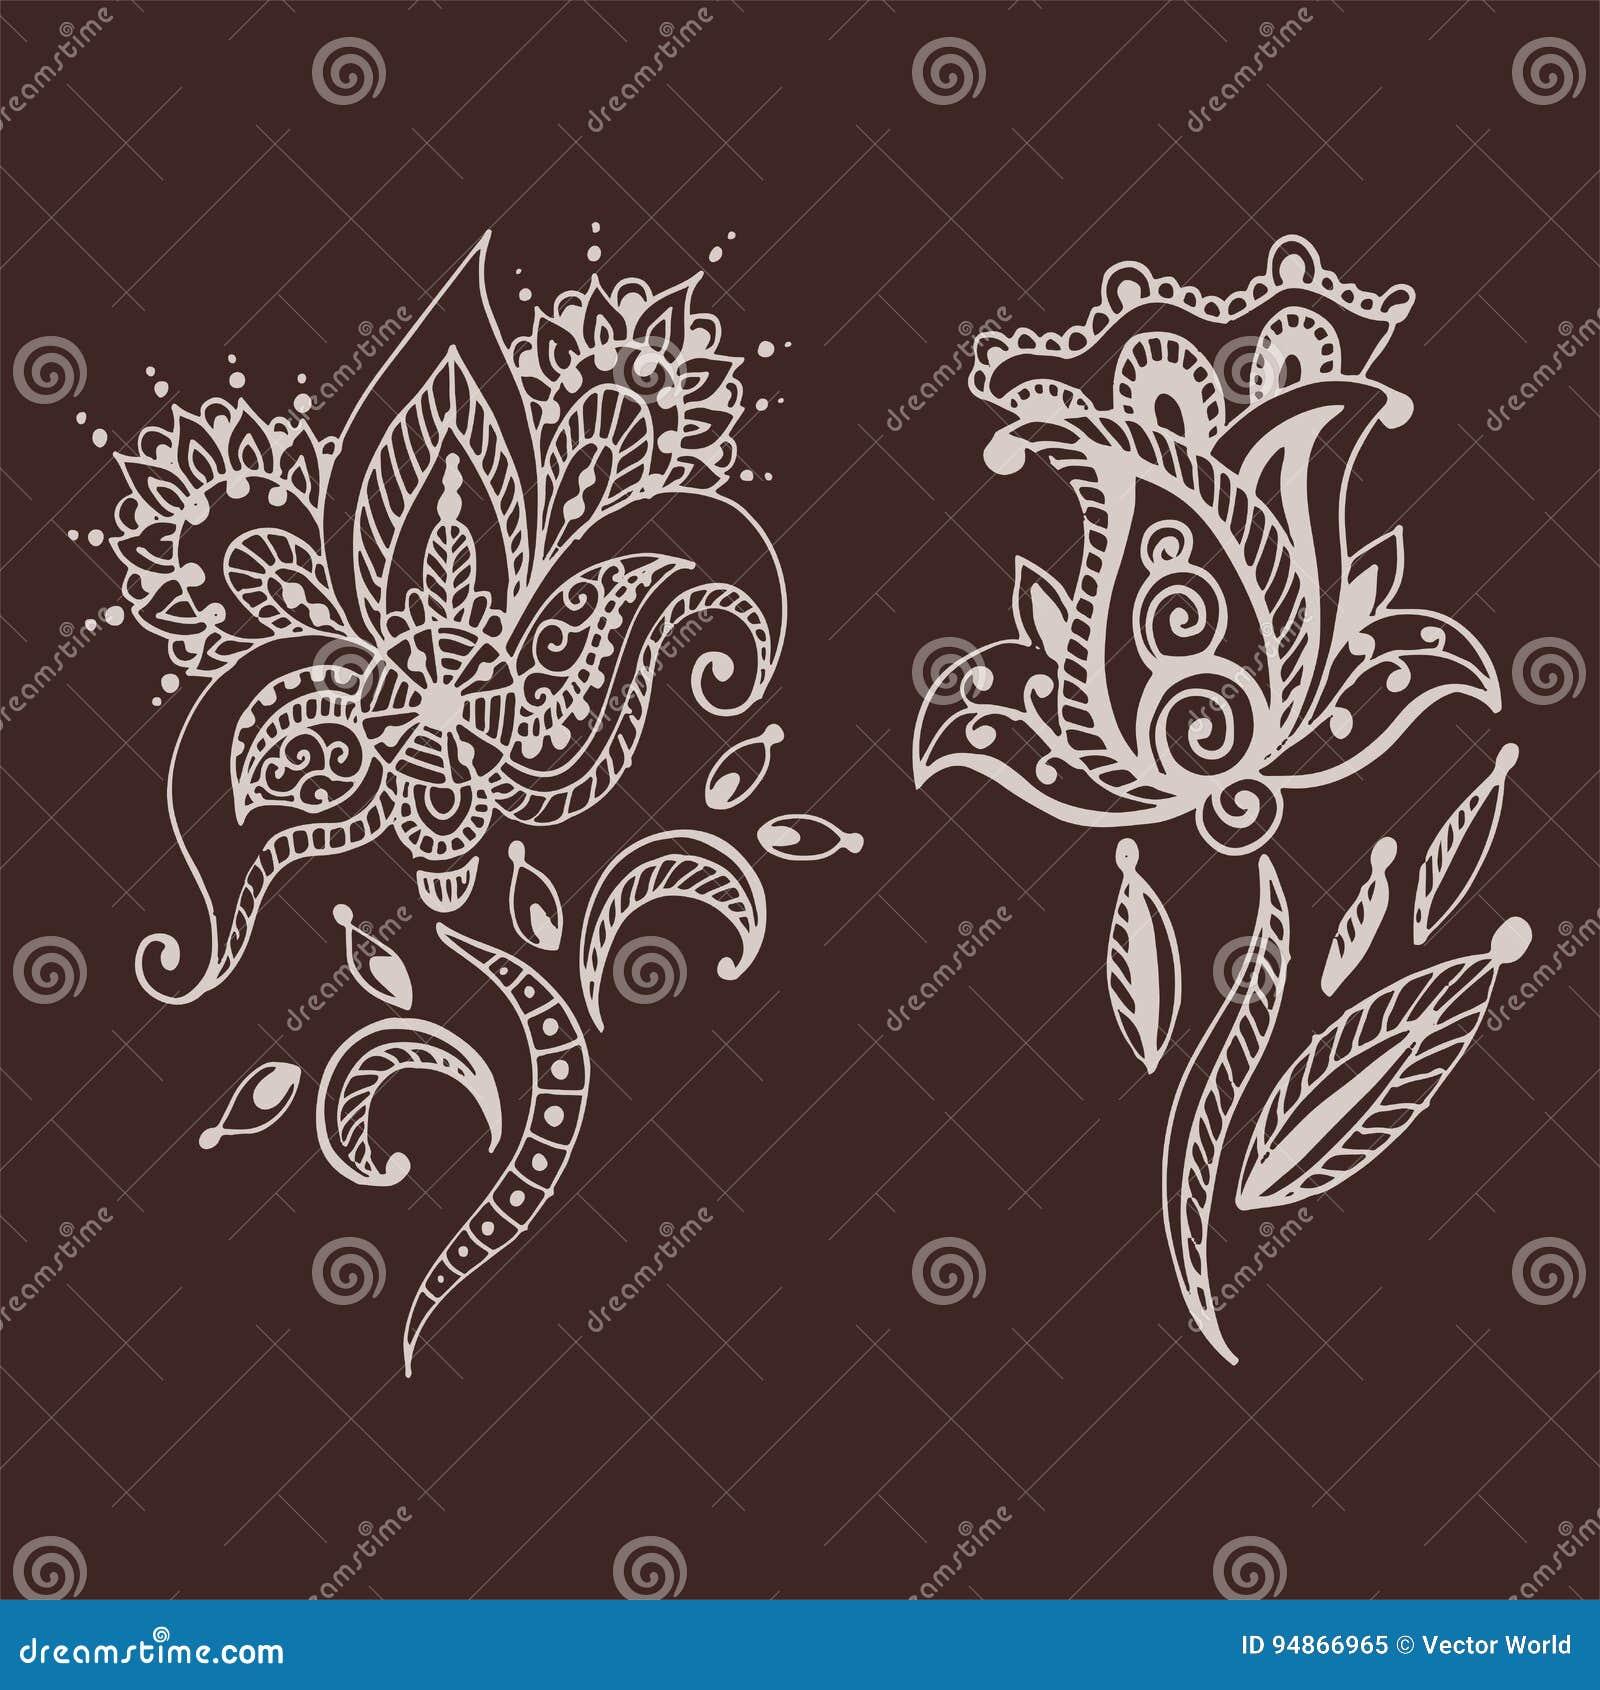 Henna δερματοστιξιών καφετί mehndi mhendi του Paisley σχεδίων σχεδίου λουλουδιών doodle διακοσμητικό διακοσμητικό ινδικό arabesqu